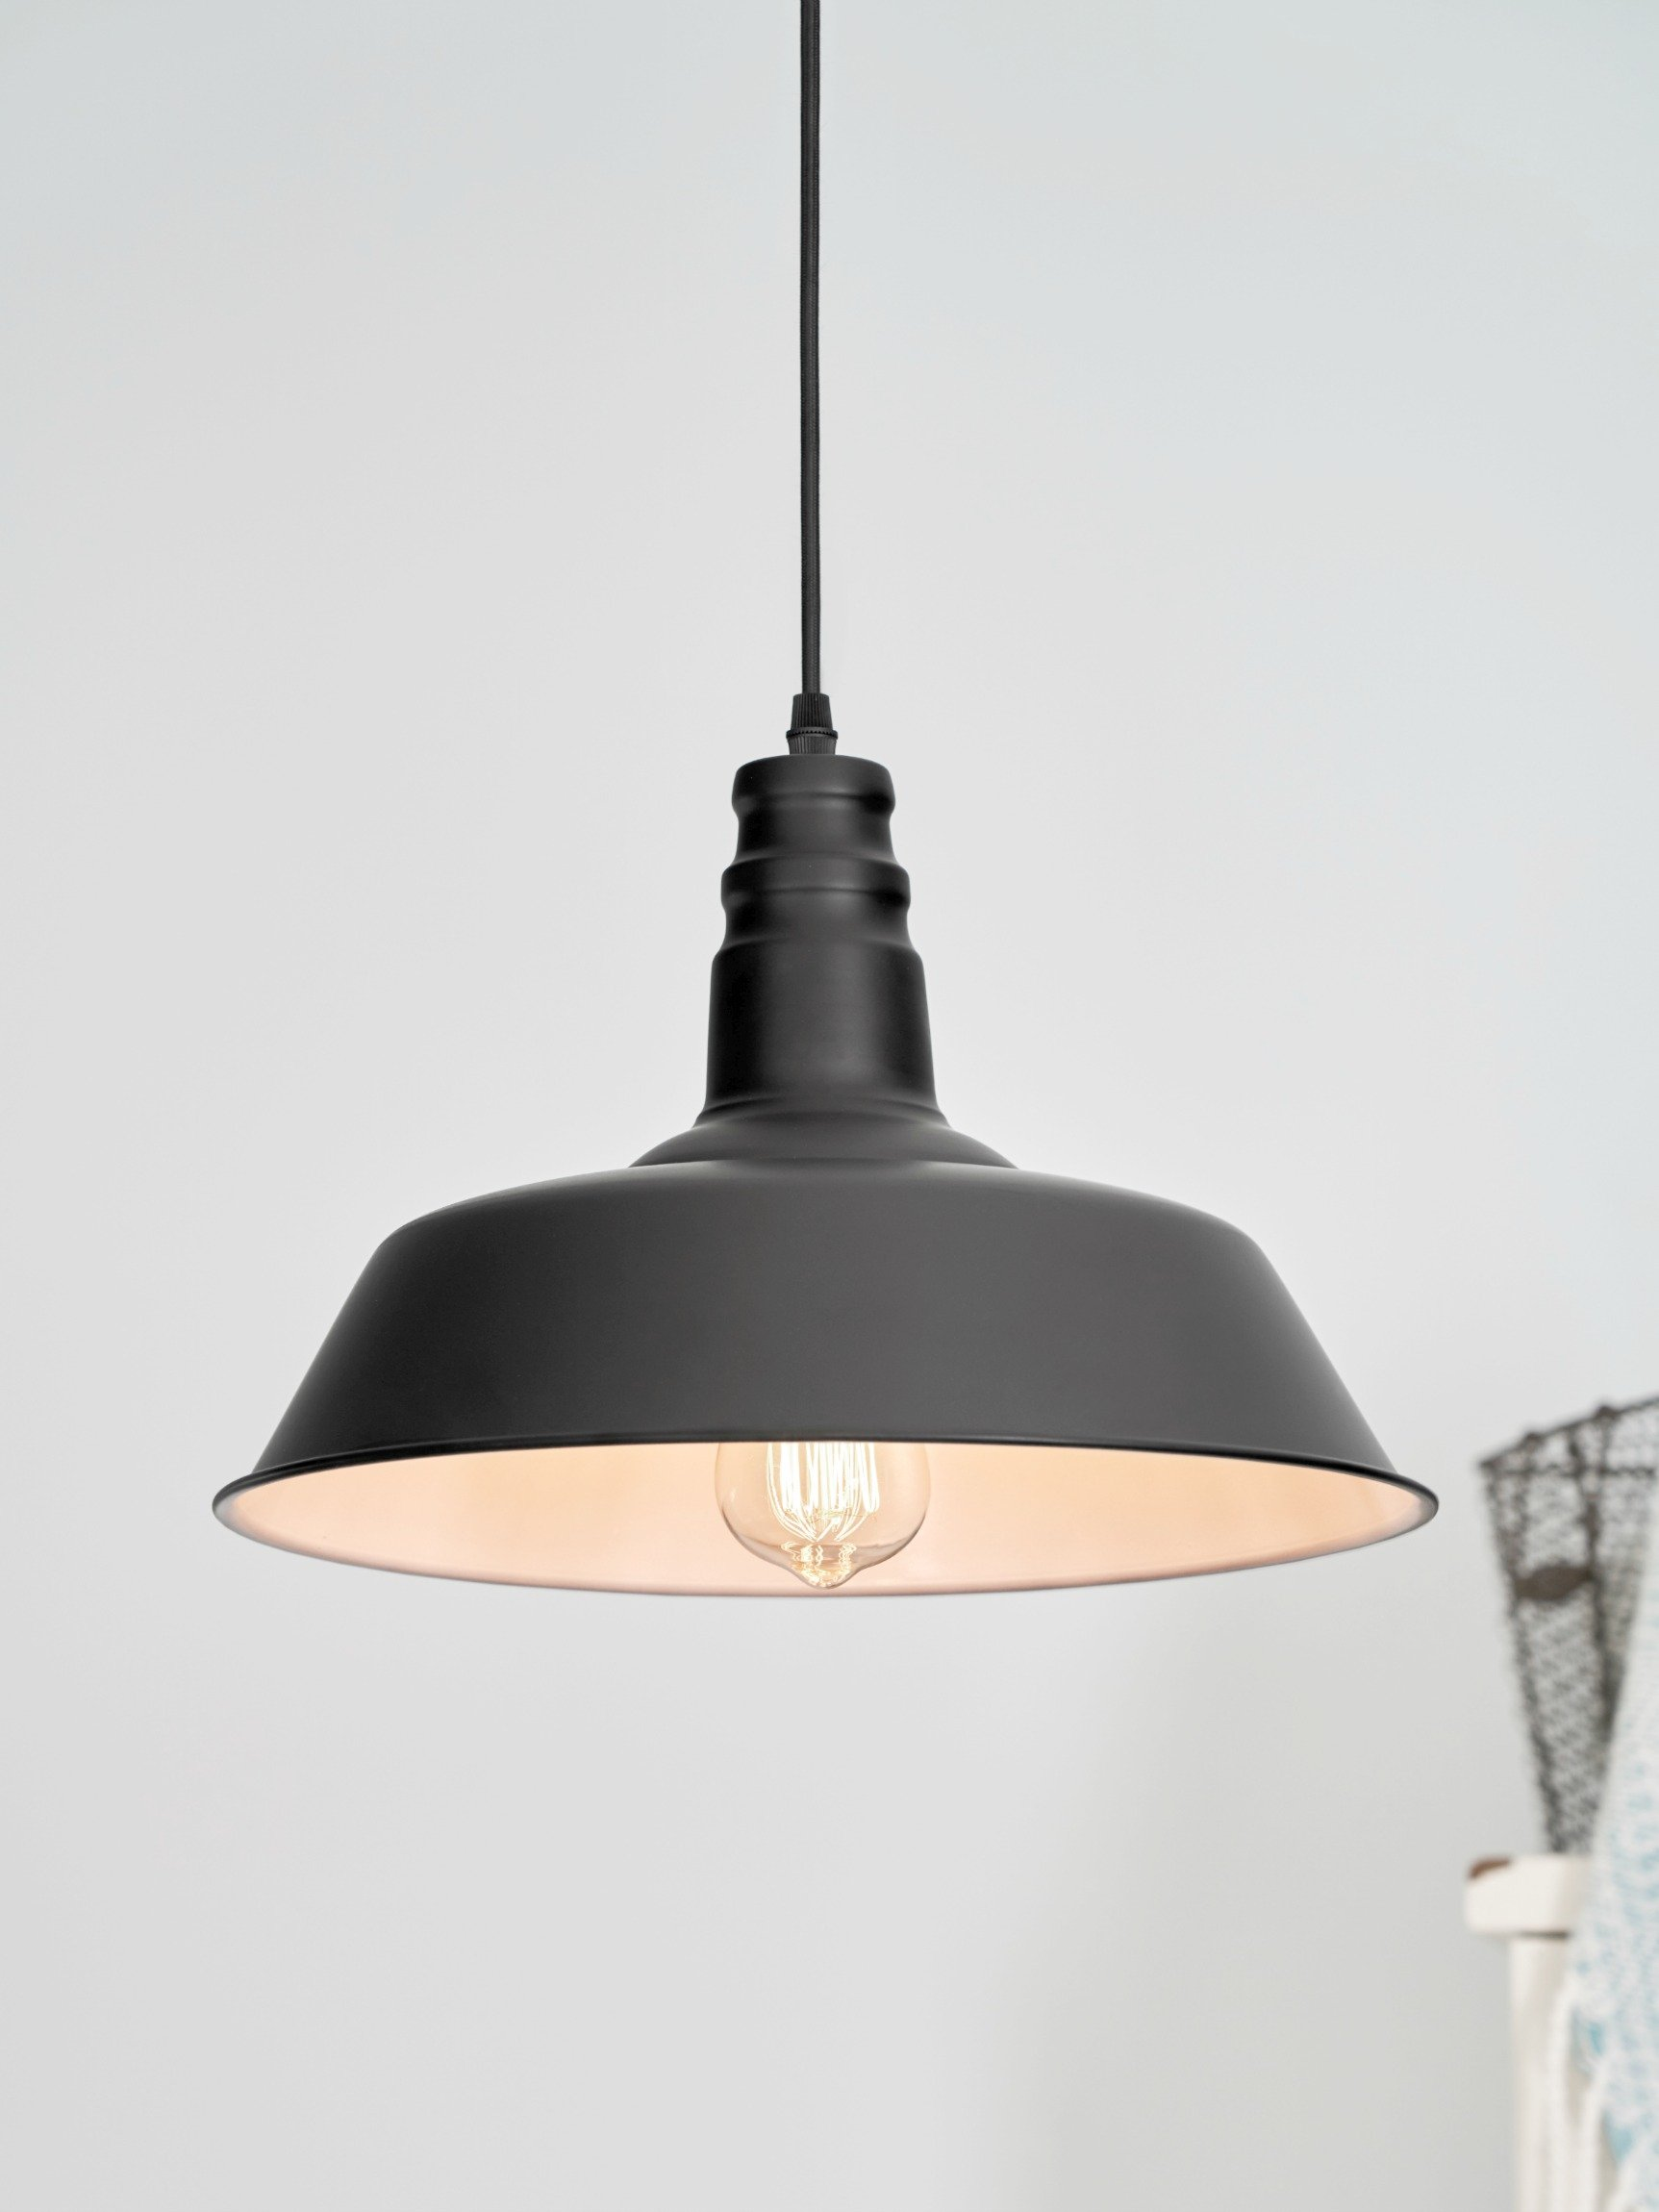 LightLady Studio - Farmhouse Lighting - Barn Pendant Light - 14'' Hanging Light Fixture - Great Fixtures for Kitchen Island Lighting Or Industrial Decor